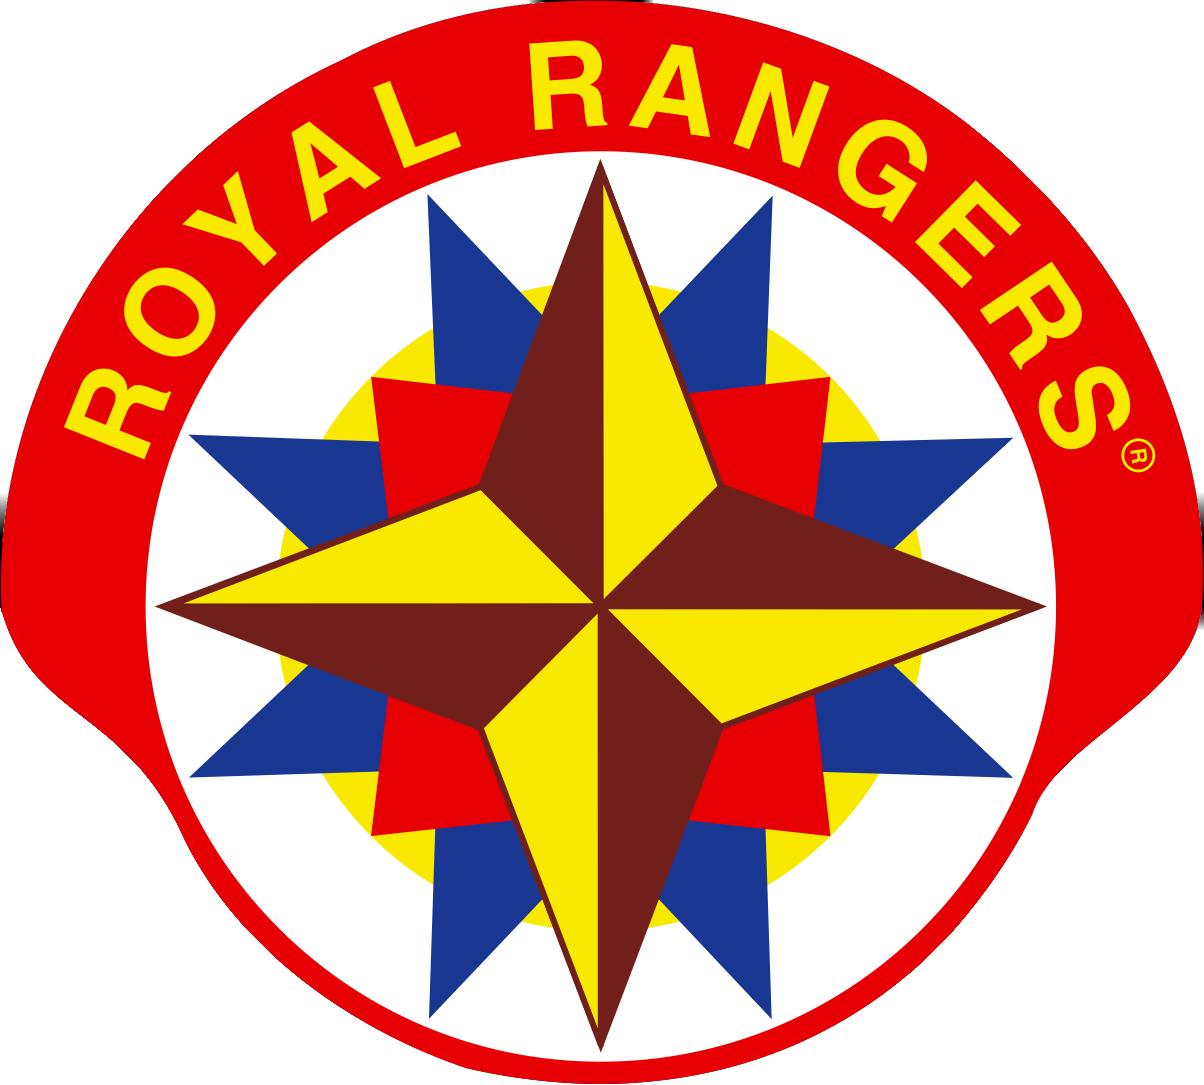 LOGO_Royal Rangers.jpg